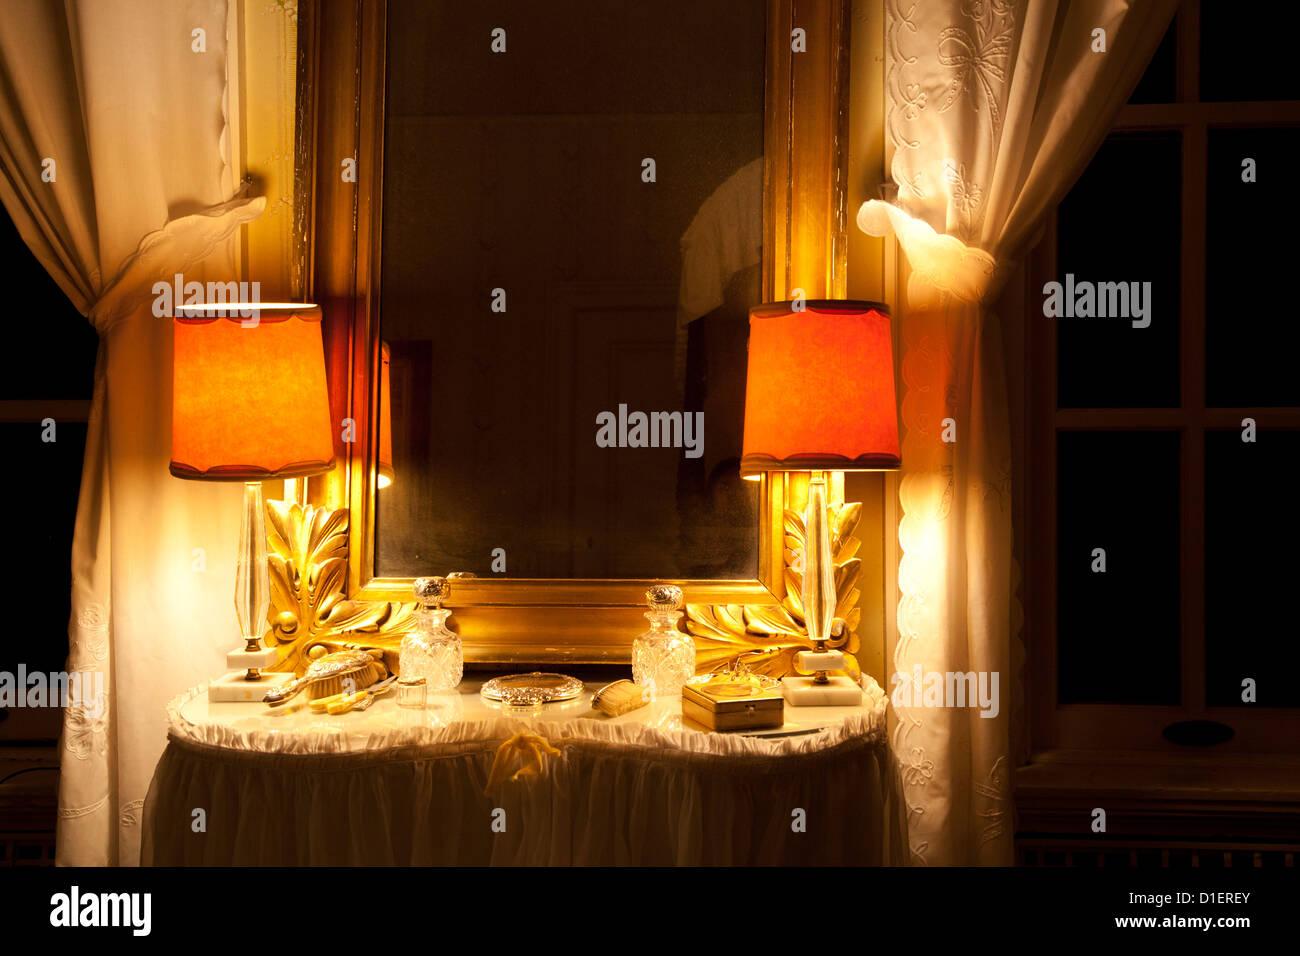 Tocador con luces y cortinas foto imagen de stock for Cortinas con luces